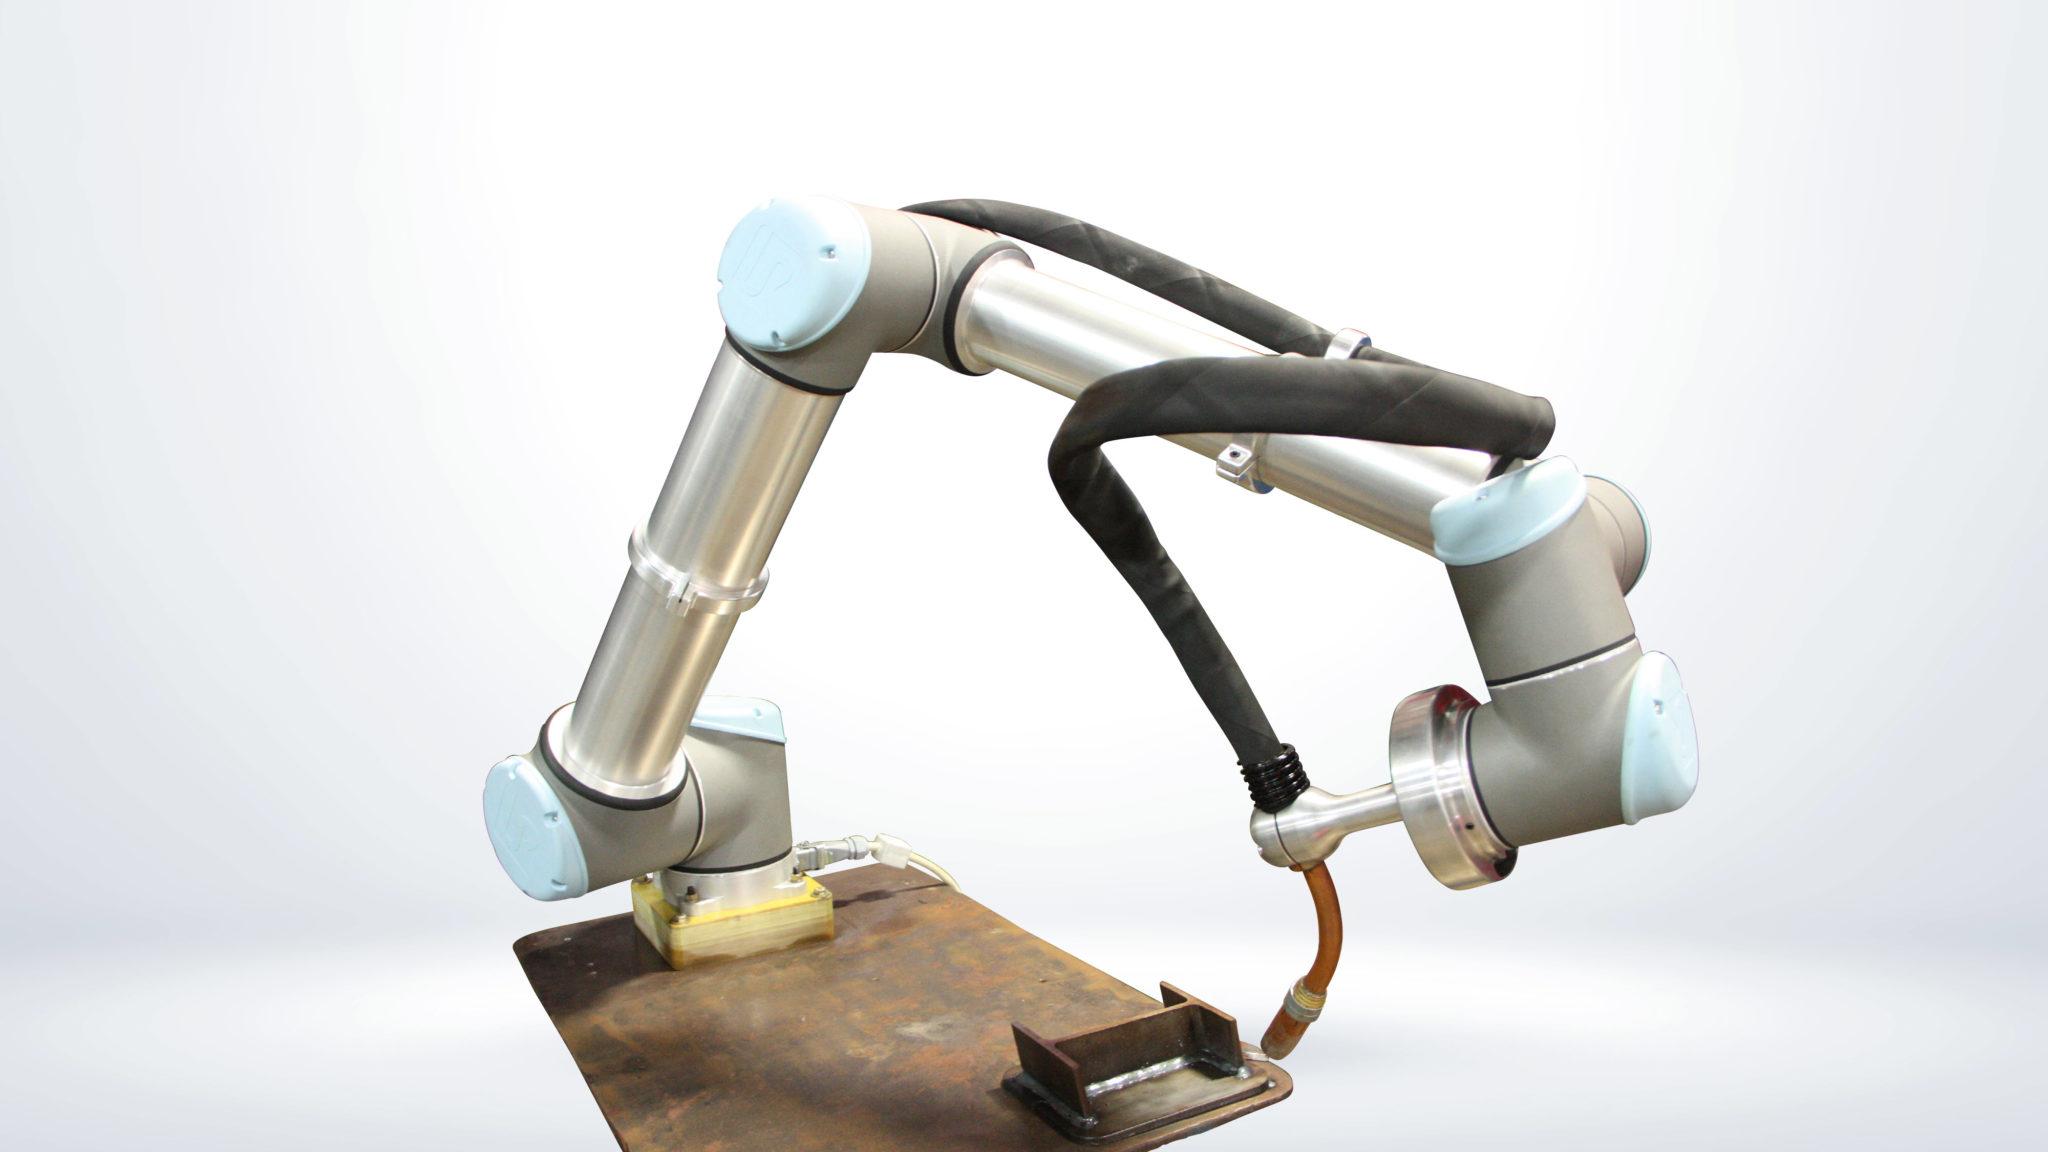 ARC Specialties Snapweld robotic arm